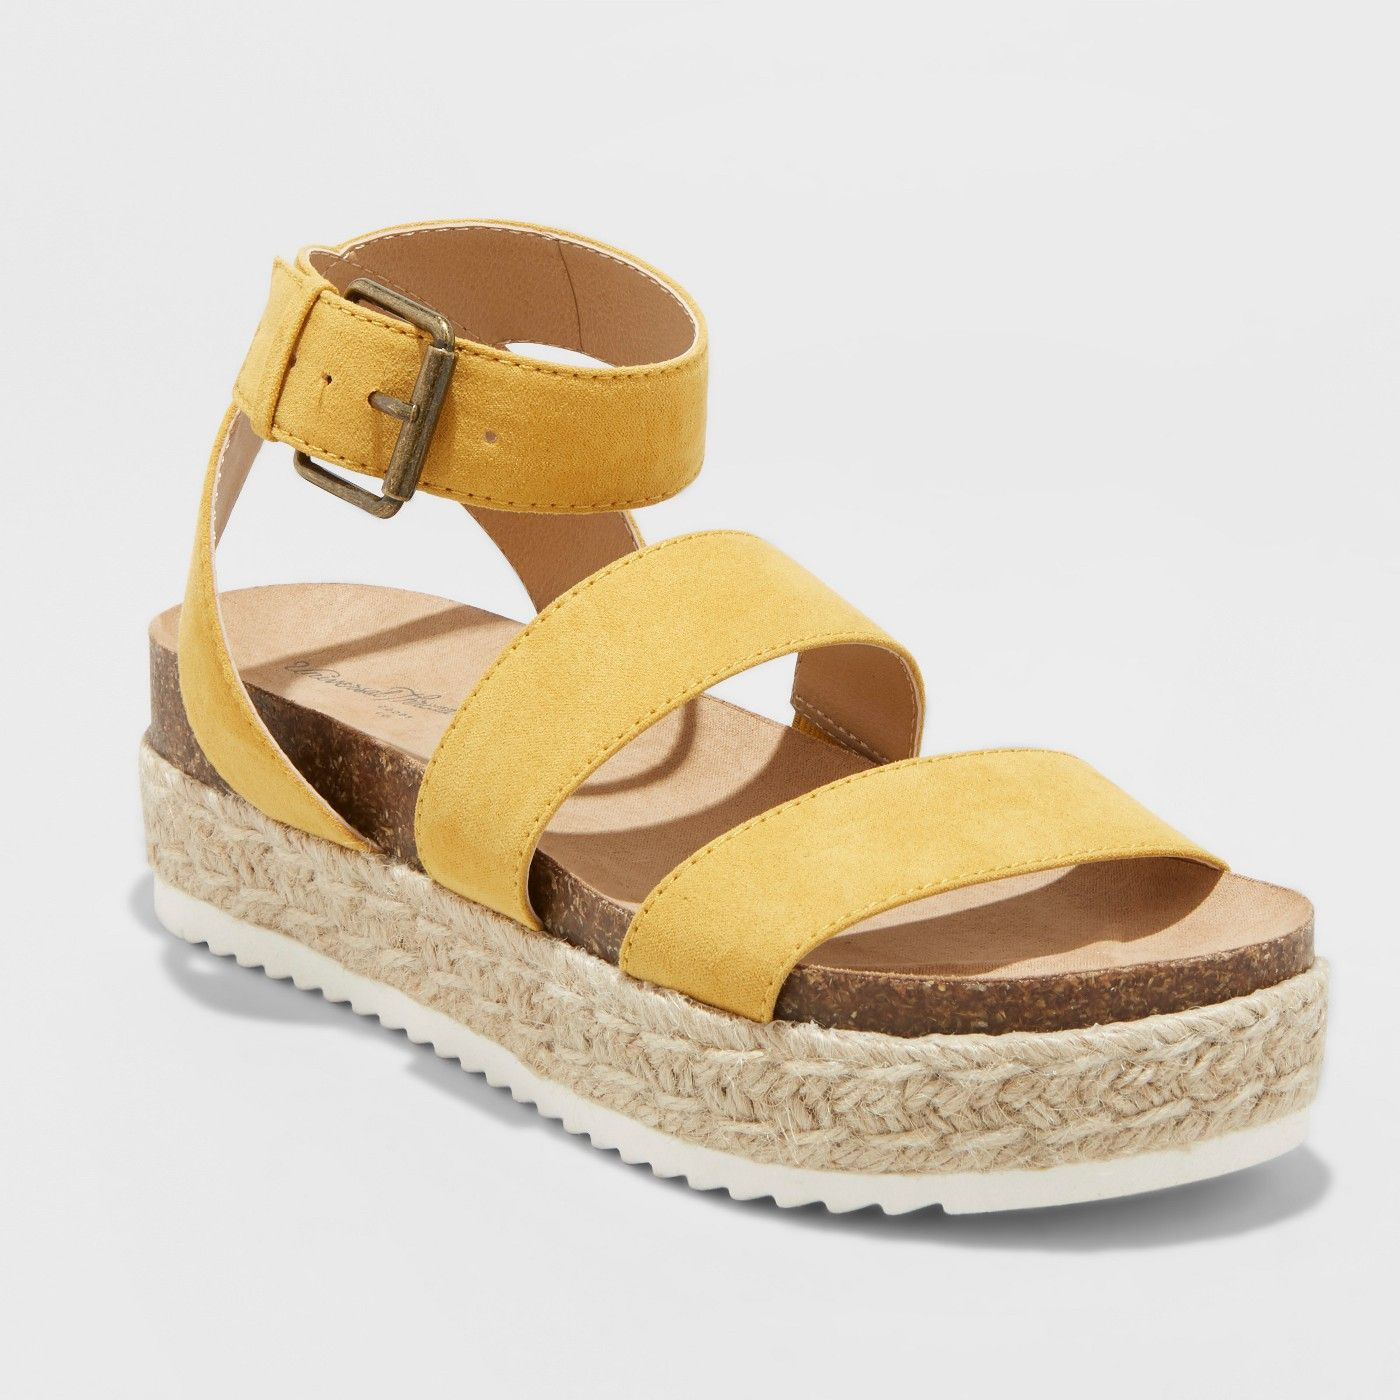 aa219ea3c6d Universal Thread Women's Agnes Quarter Strap Espadrille Sandals | To ...